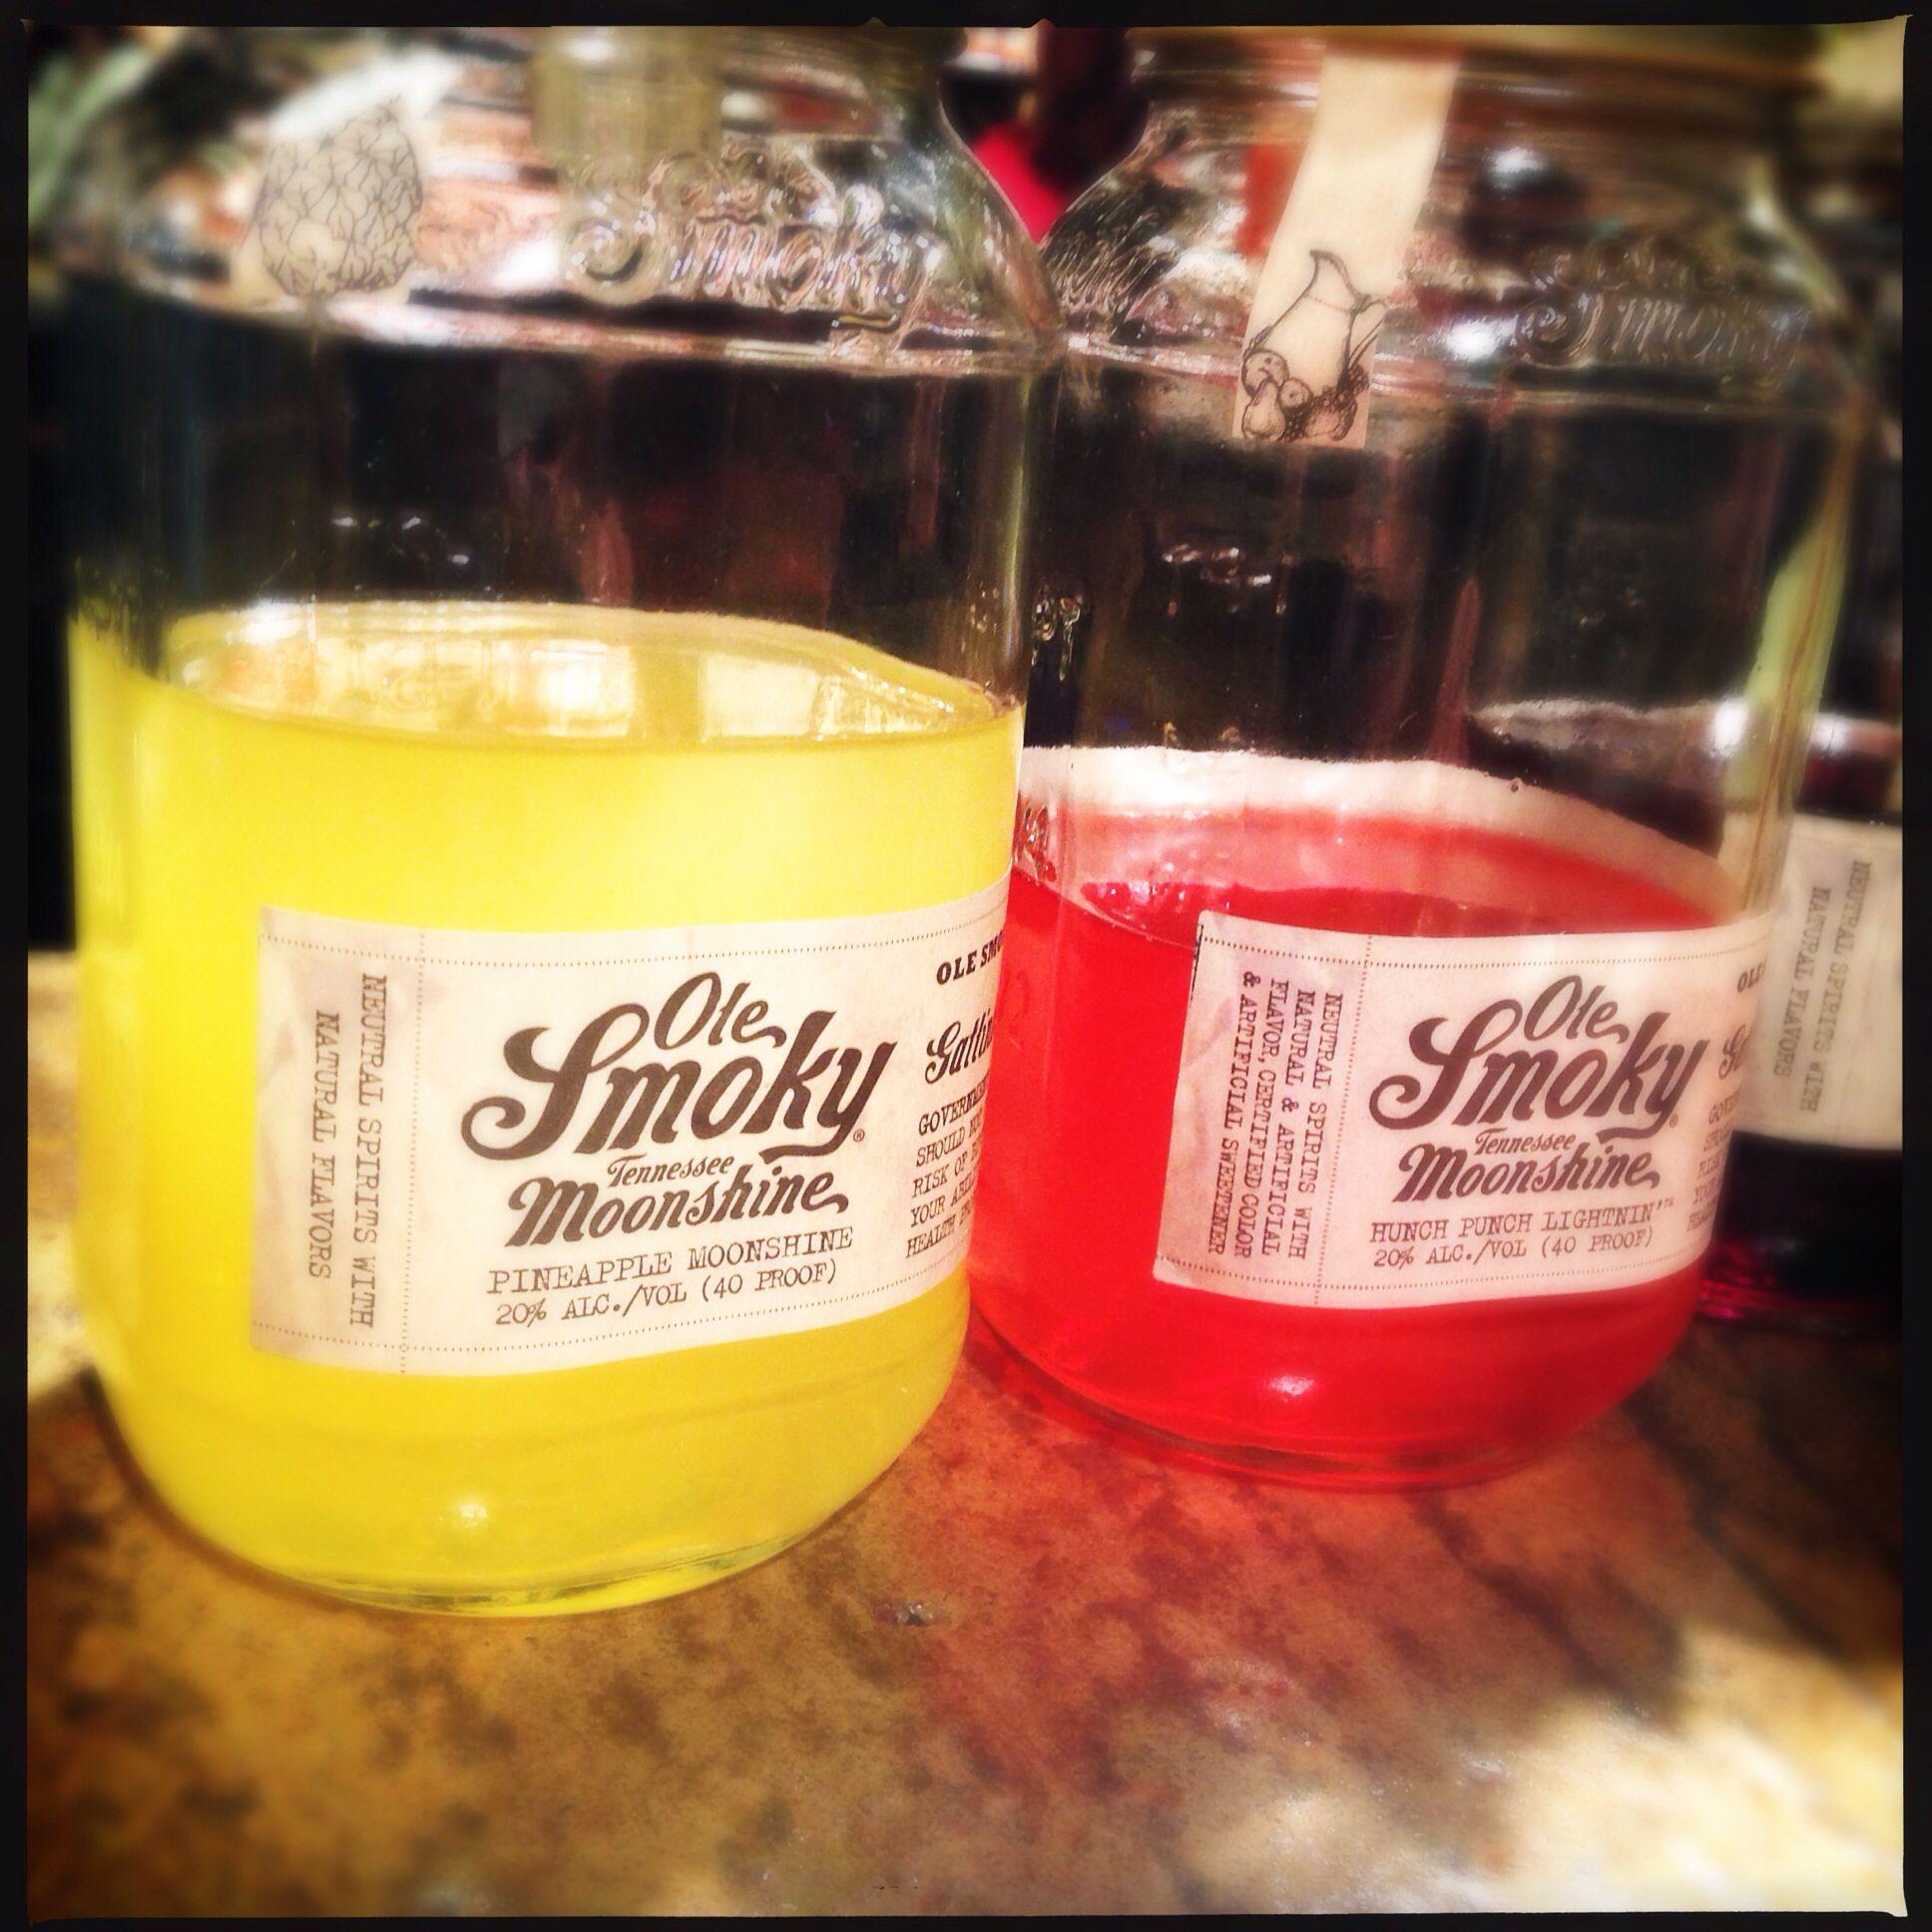 Ole Smoky Moonshine In Gatlinburg The Free Tastings Are Fun Ole Smoky Moonshine Tasty Tasting